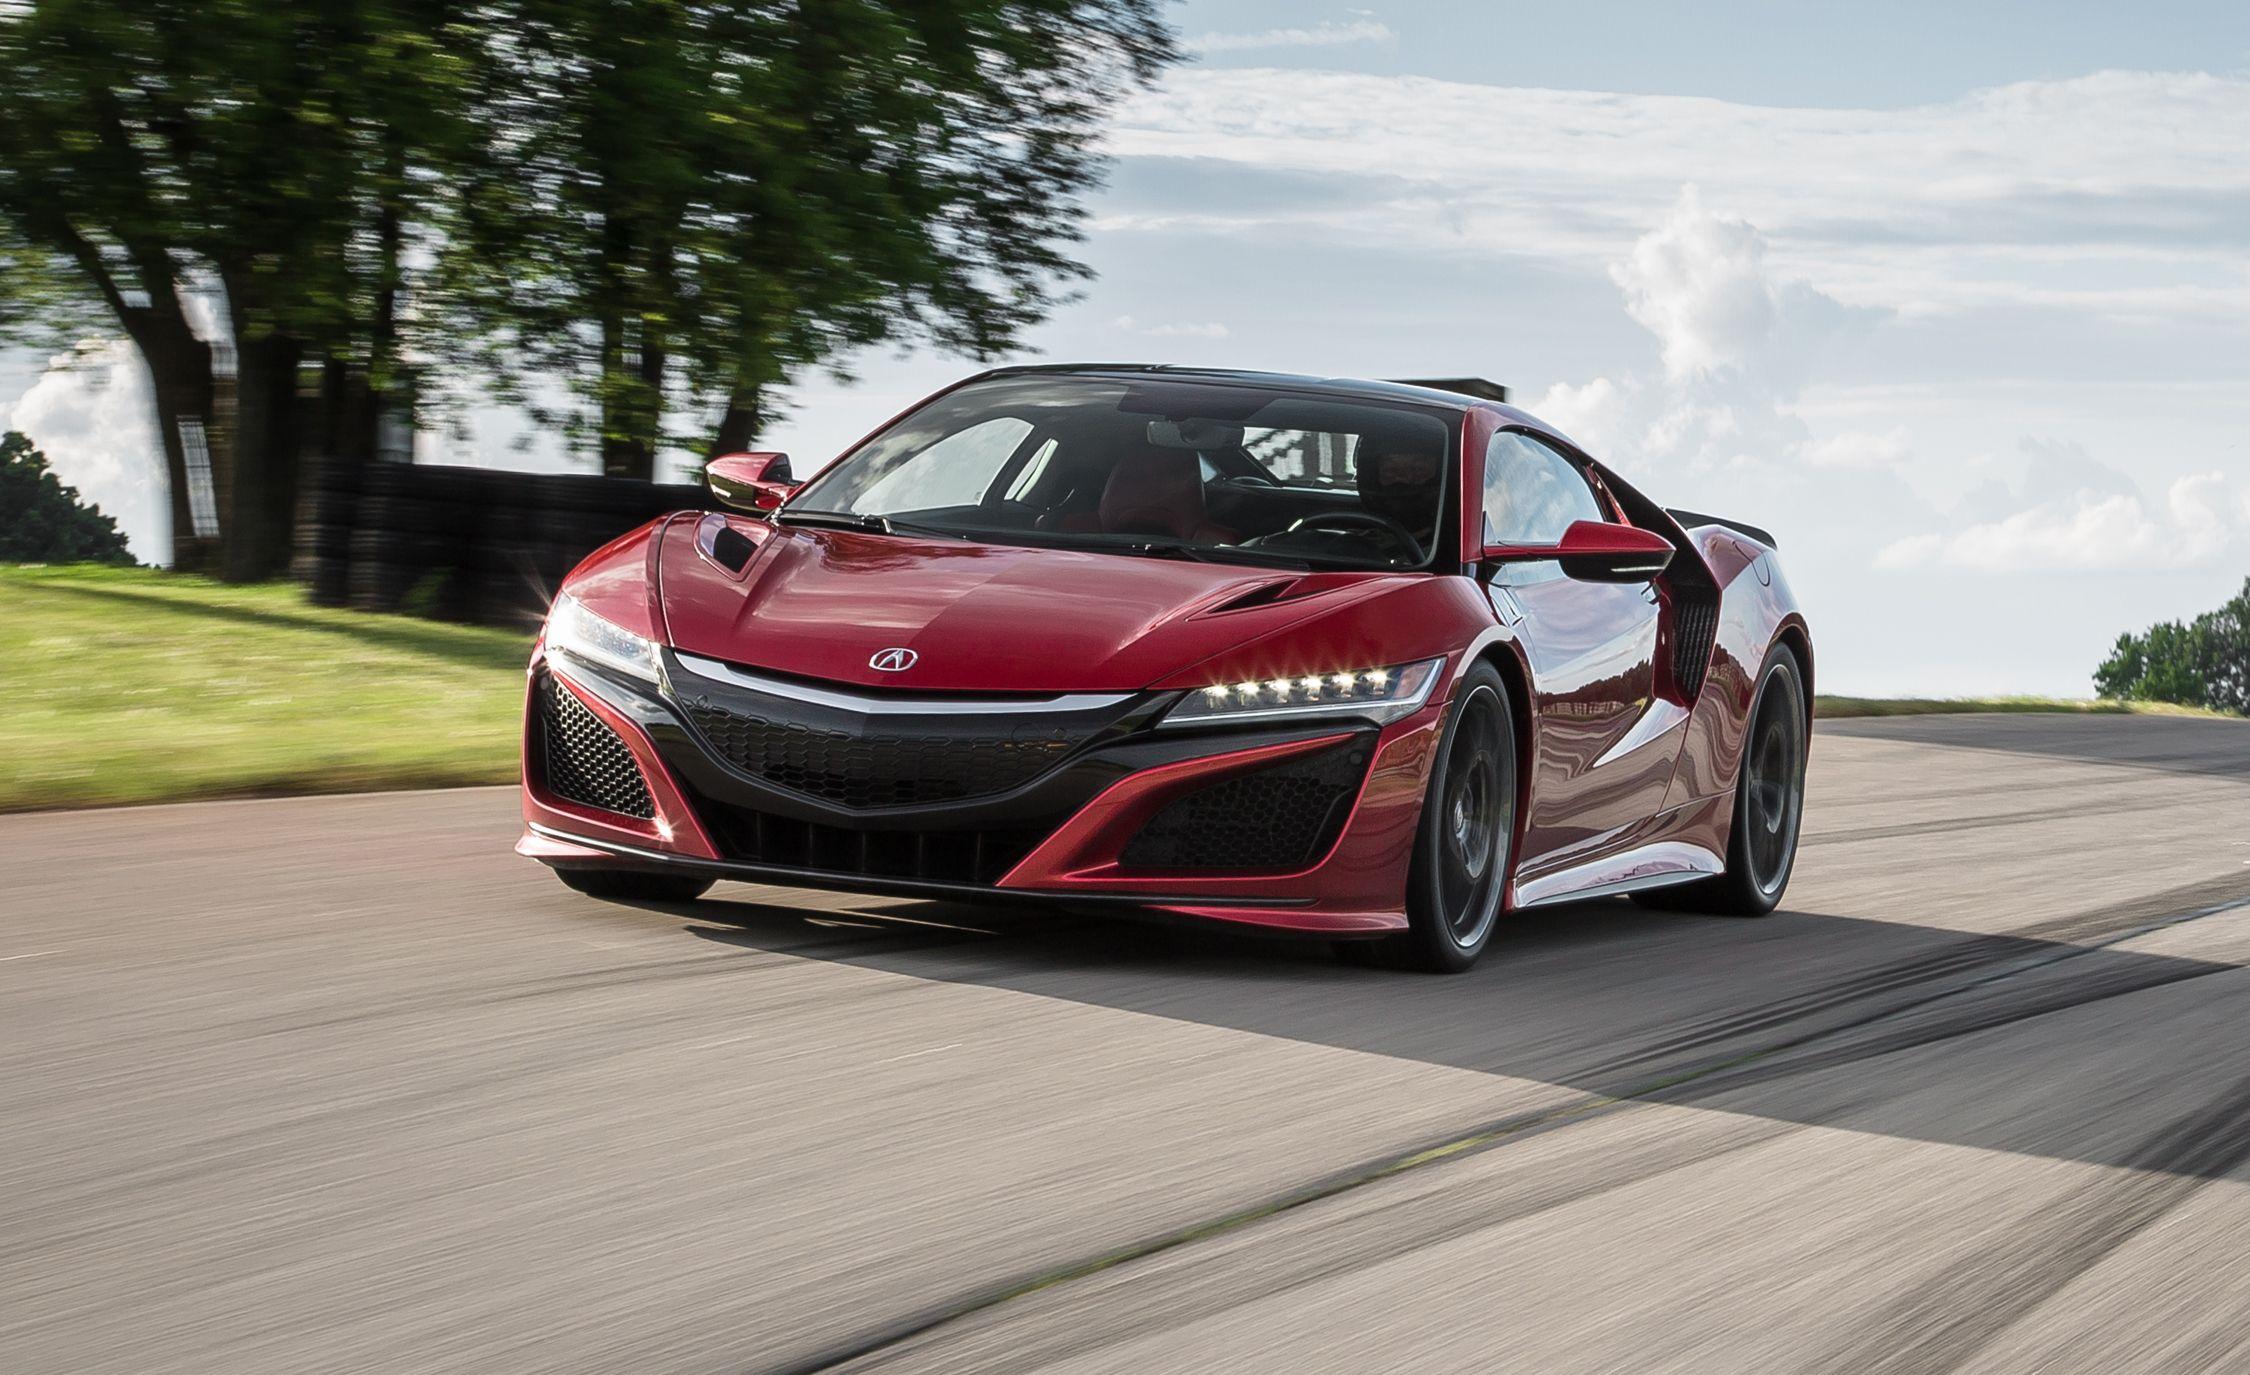 Acura NSX Reviews | Acura NSX Price, Photos, and Specs ...